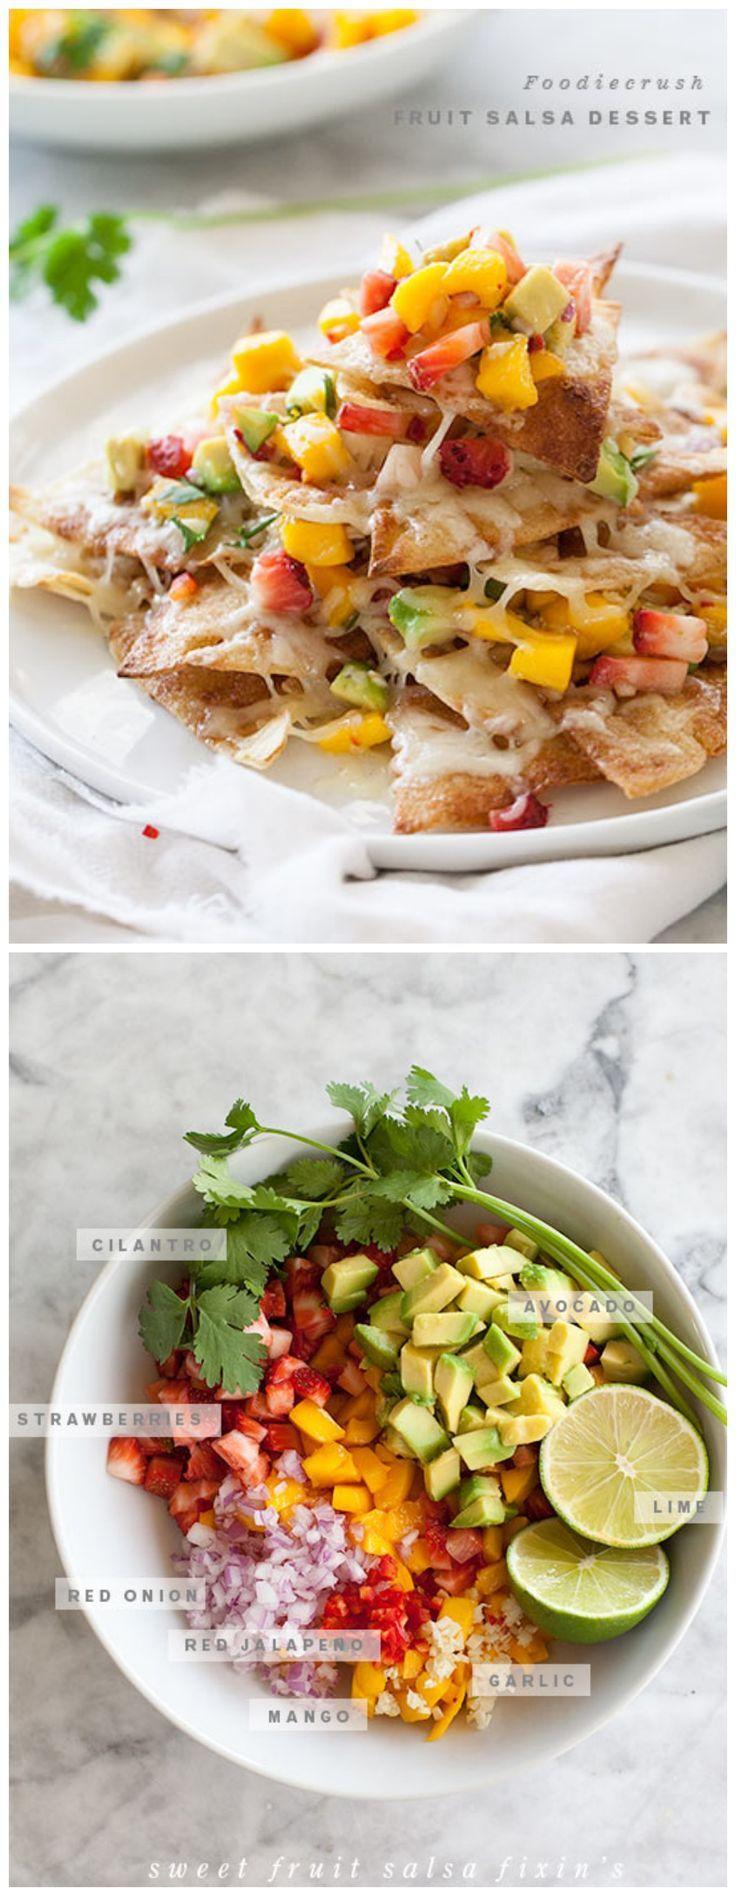 Dessert #Nachos with Strawberry, #Mango and #Avocado Salsa by foodiecrush. #dessert #recipe